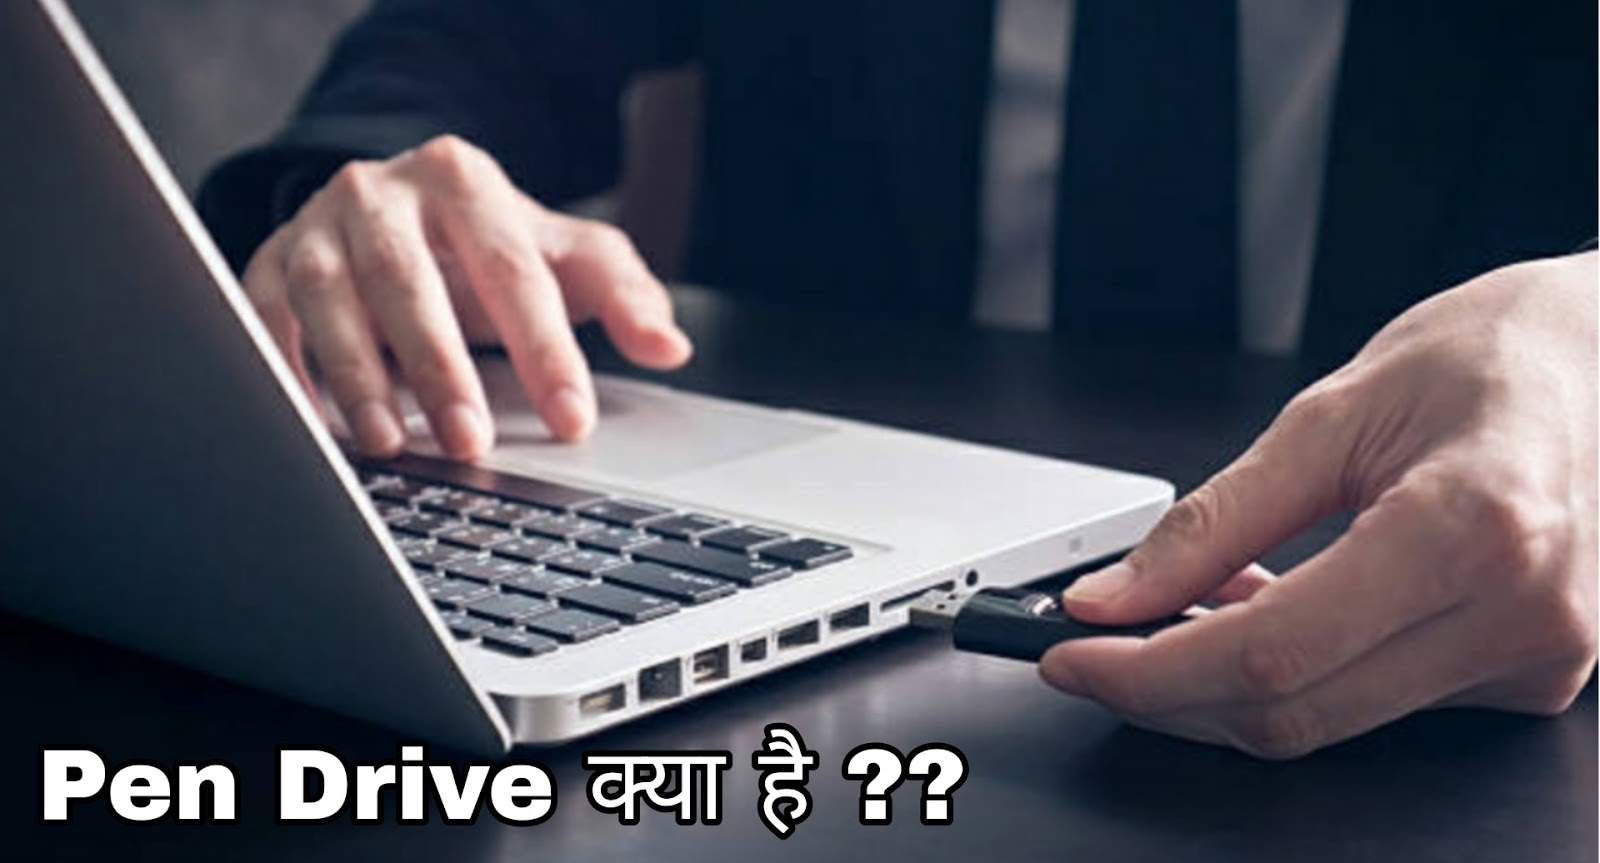 Pen_Drive_Kya_Hai